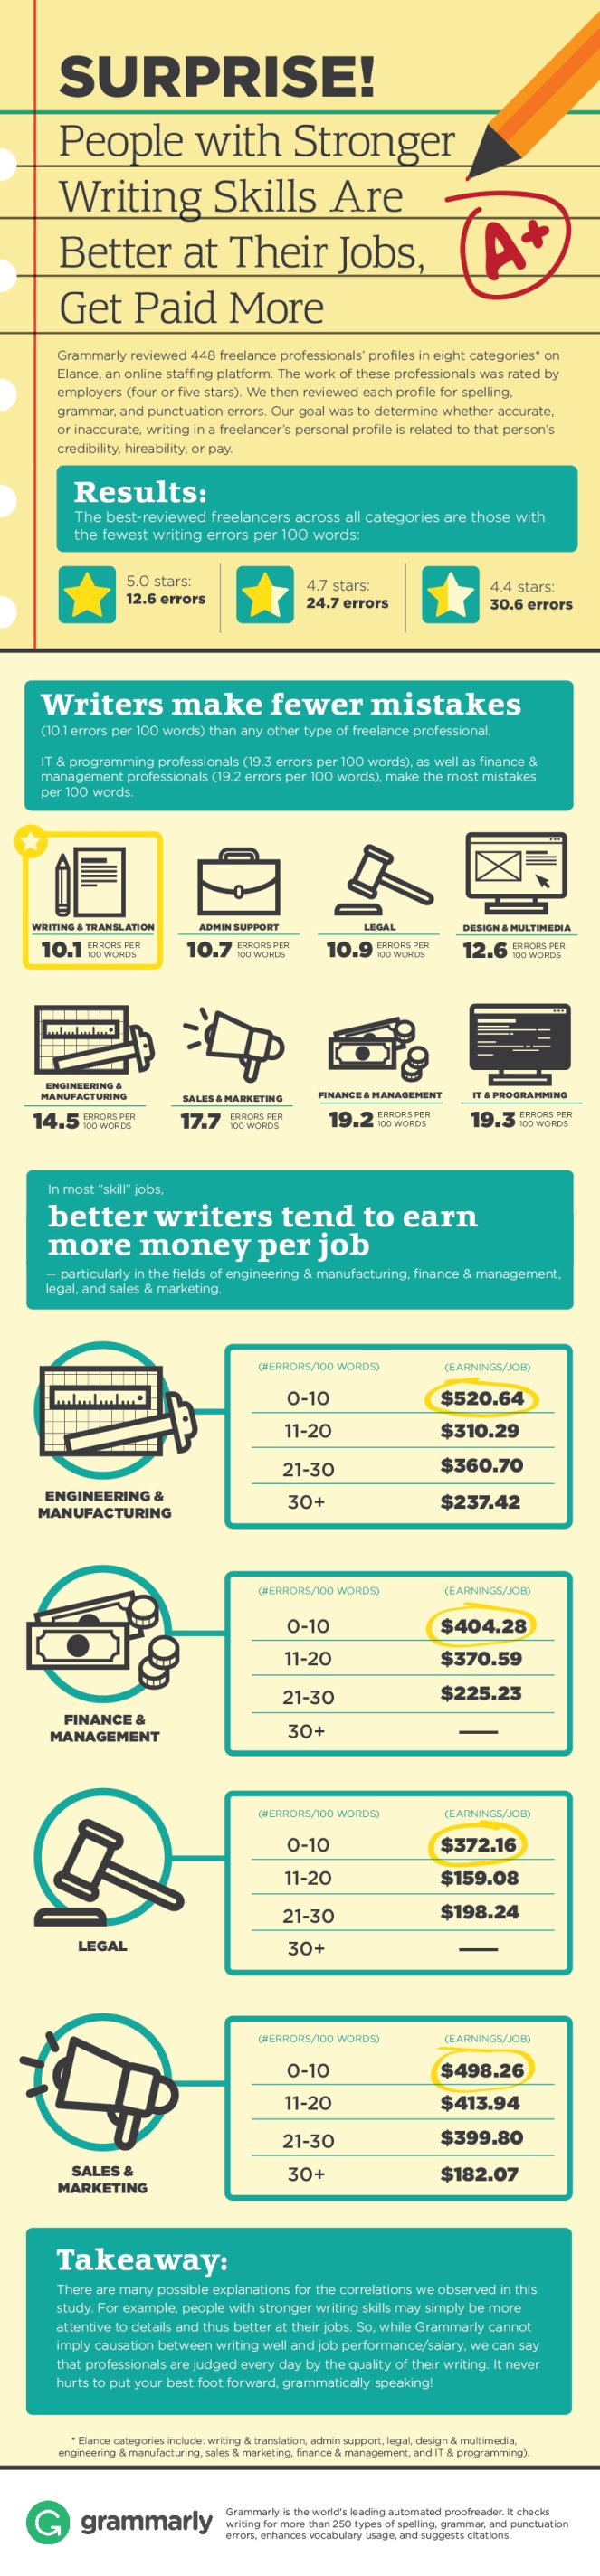 writing_skills_matter